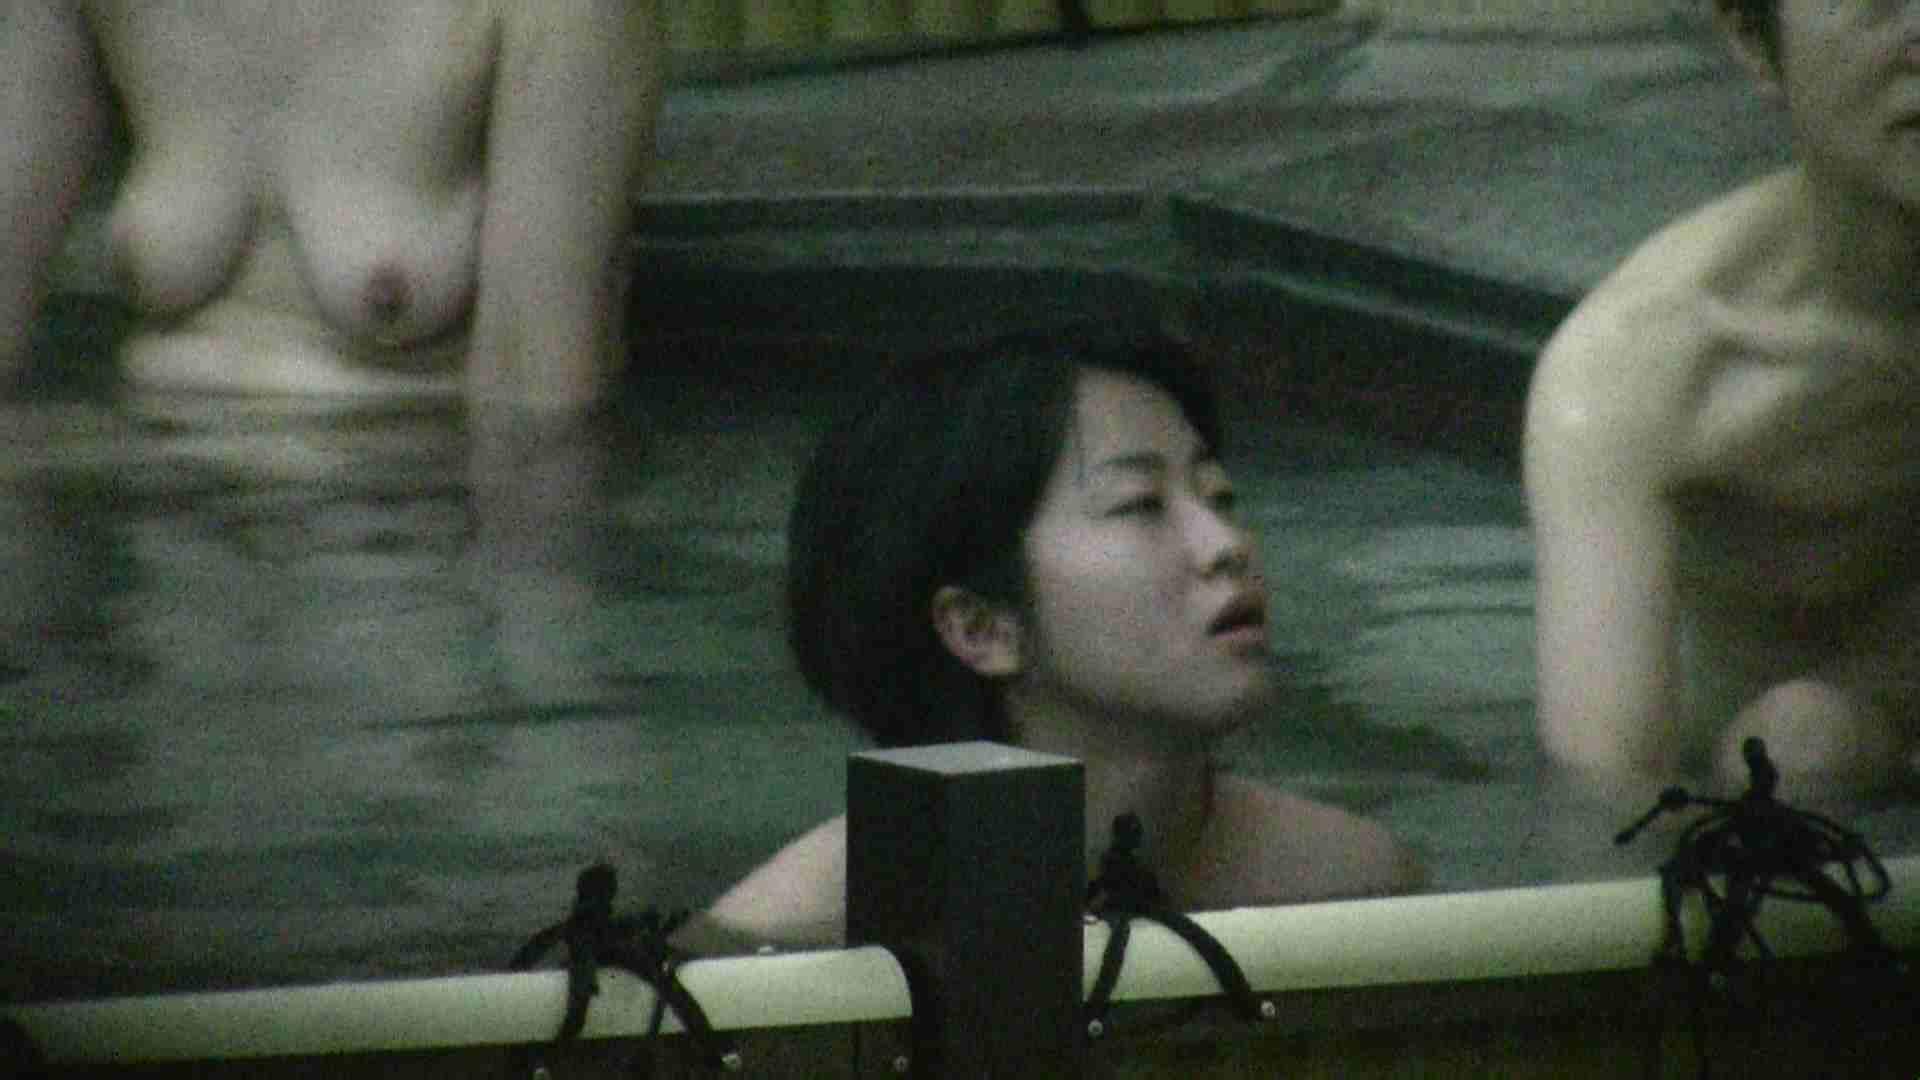 Aquaな露天風呂Vol.112 0  68連発 66